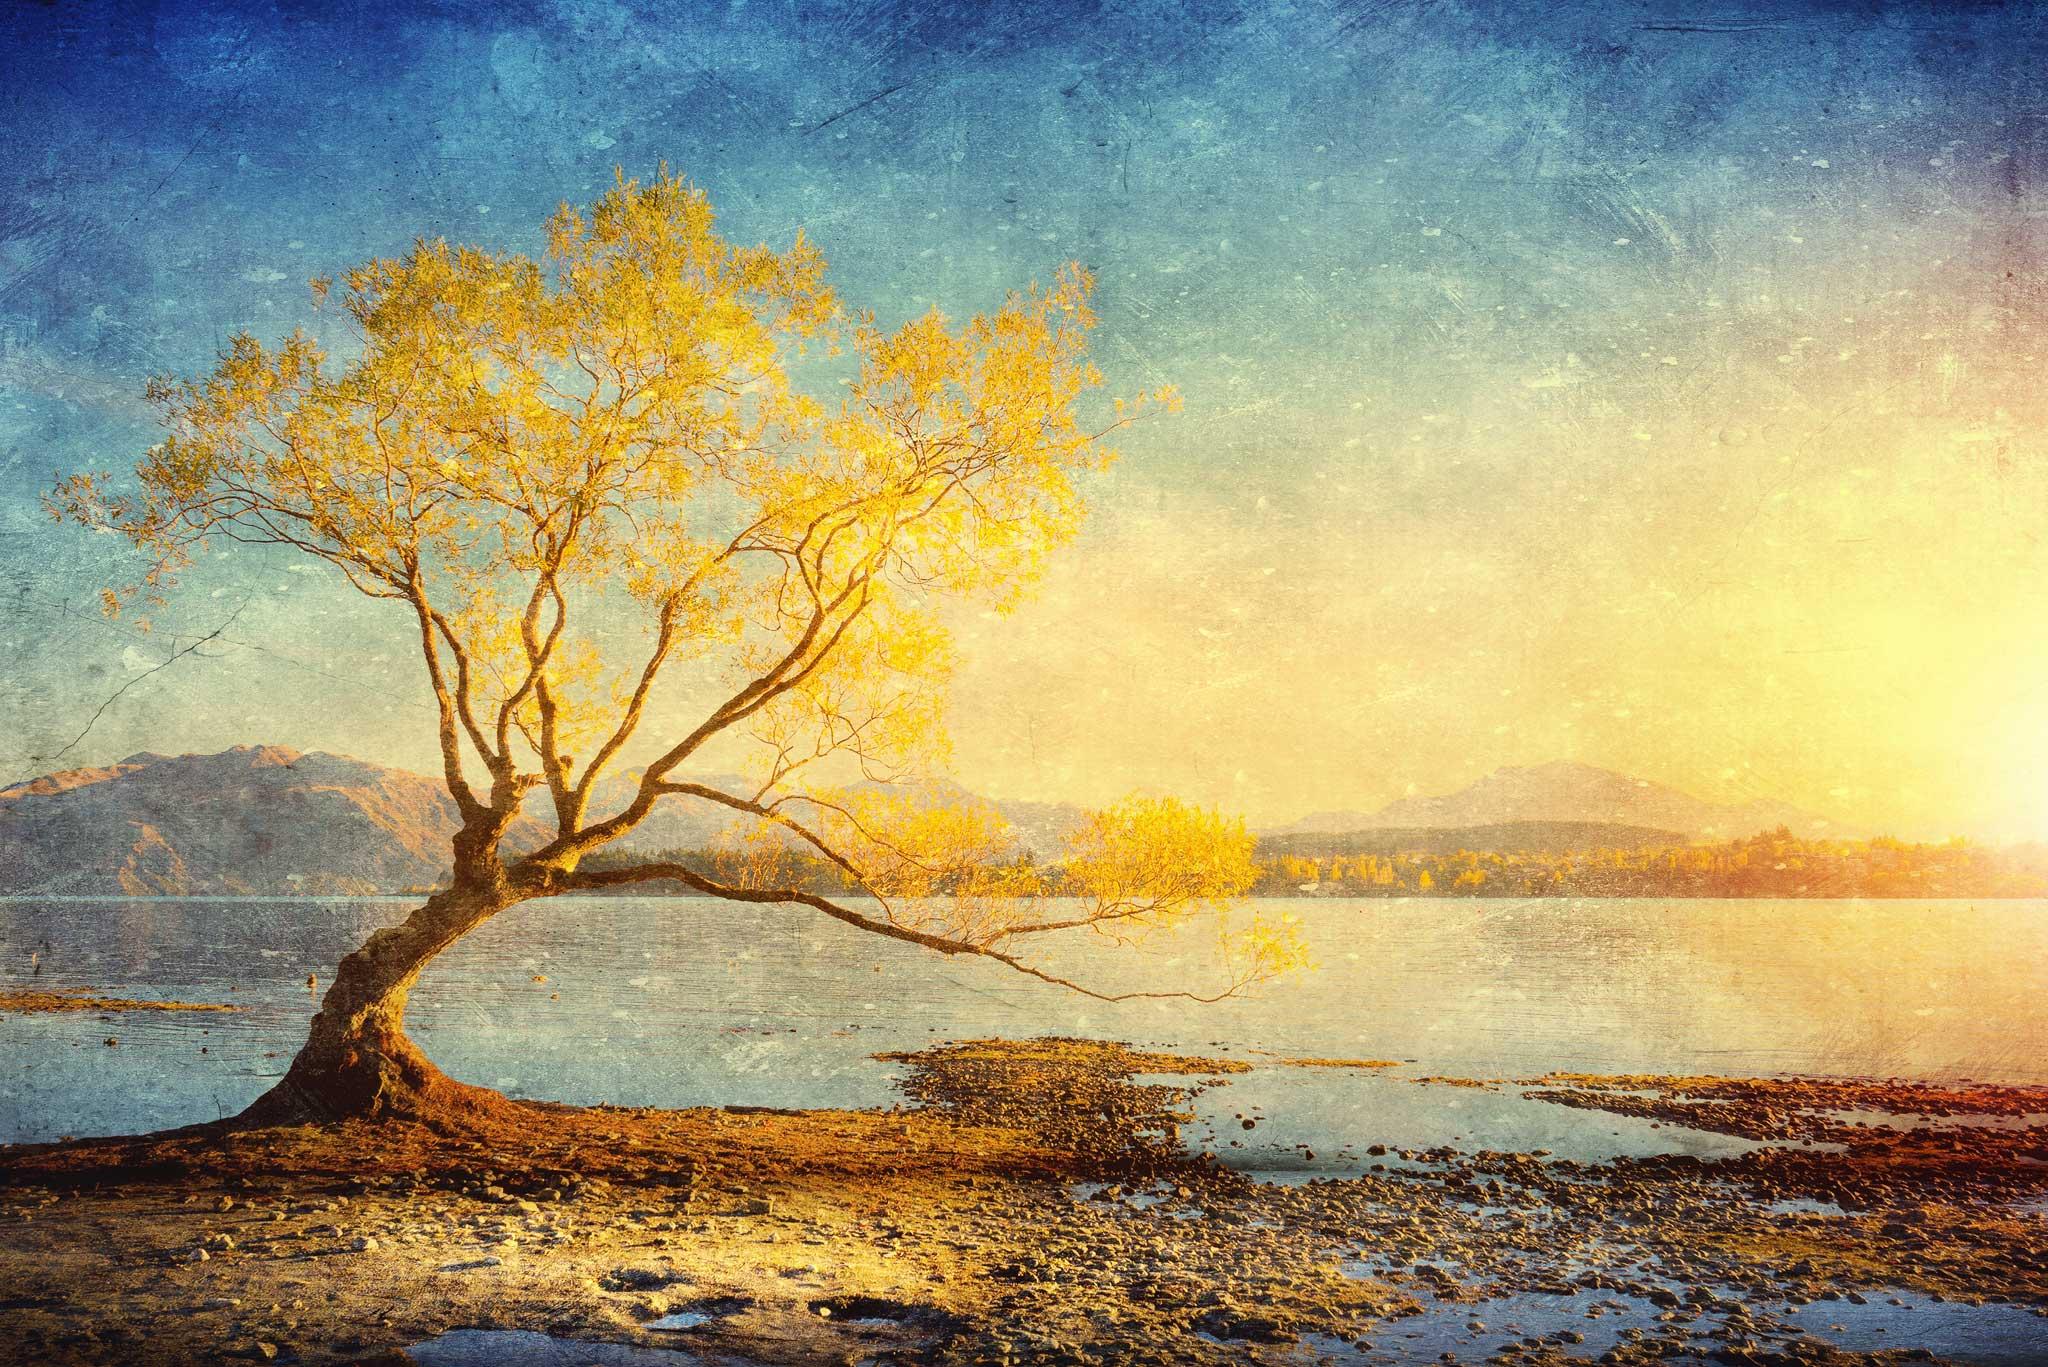 tapet-fototapet-design-decor-mural-customizabil-comanda-personalizat-bucuresti-daring-prints-motiv-model-desen-pictura-peisaj-copac-frunze-galbene